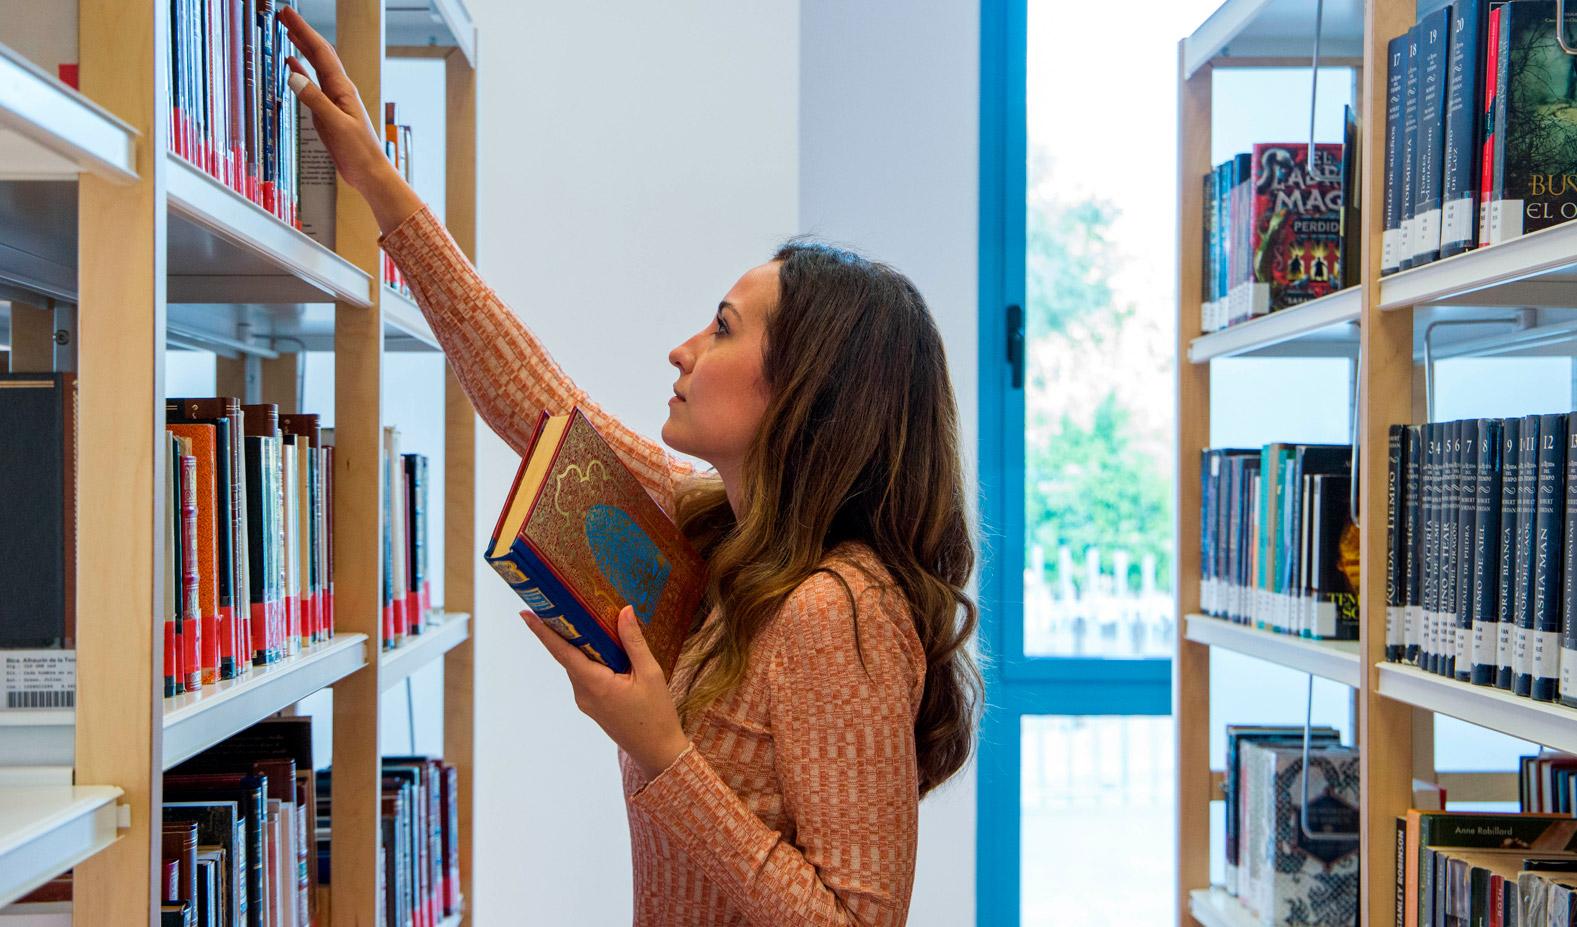 Centro de Interés de la Biblioteca Pública Municipal de Alhaurín de la Torre